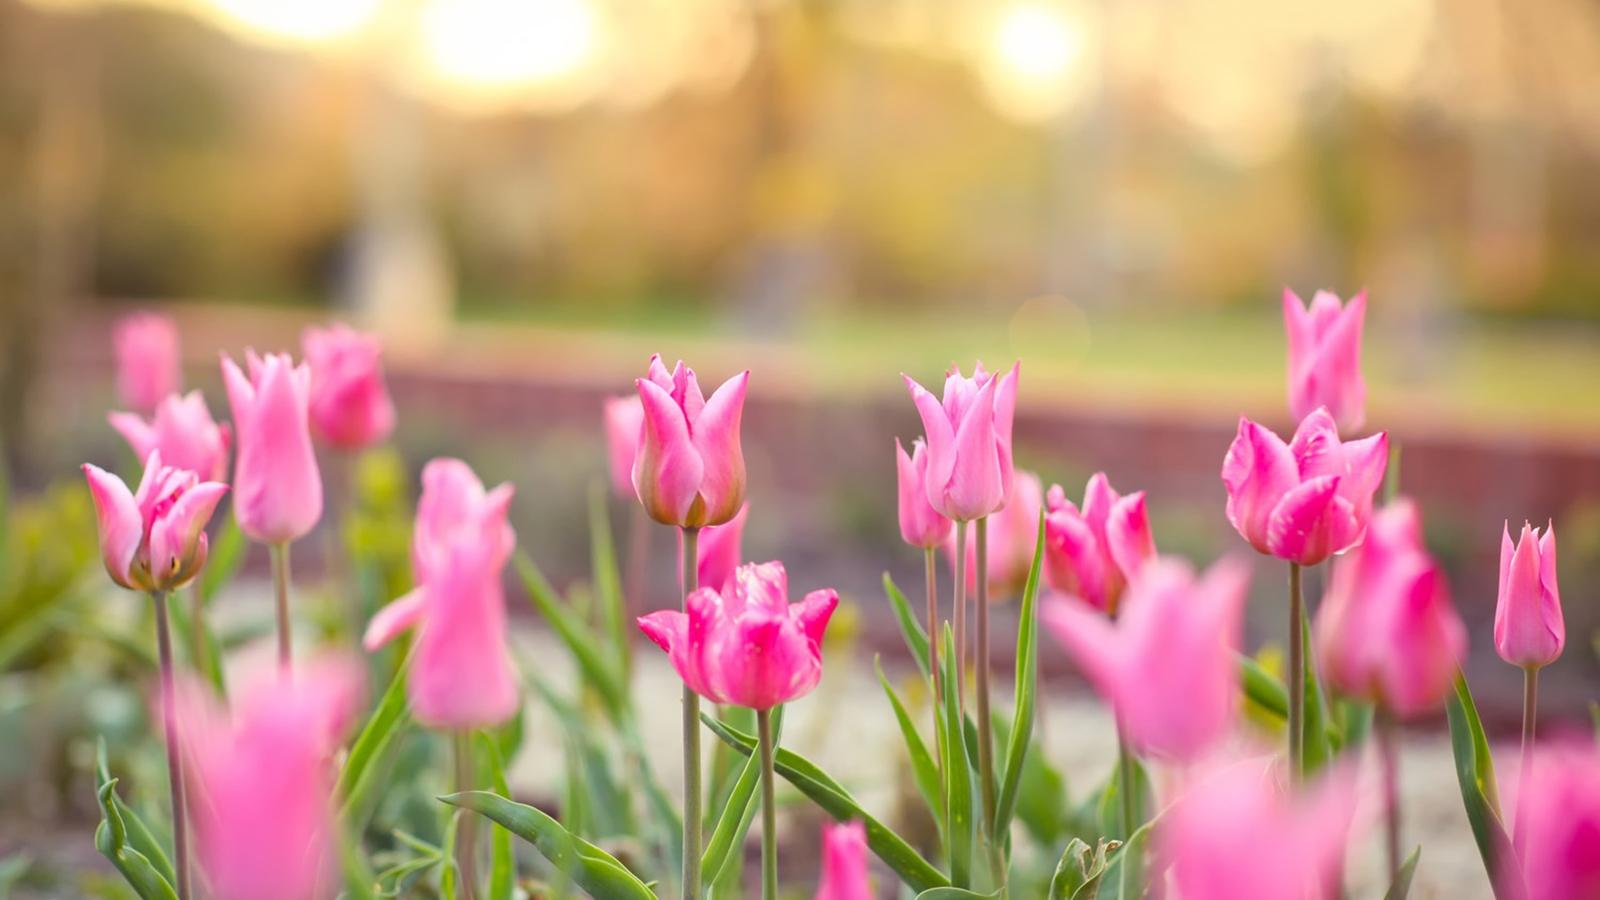 Image: Tulips, flowers, pink, flowerbed